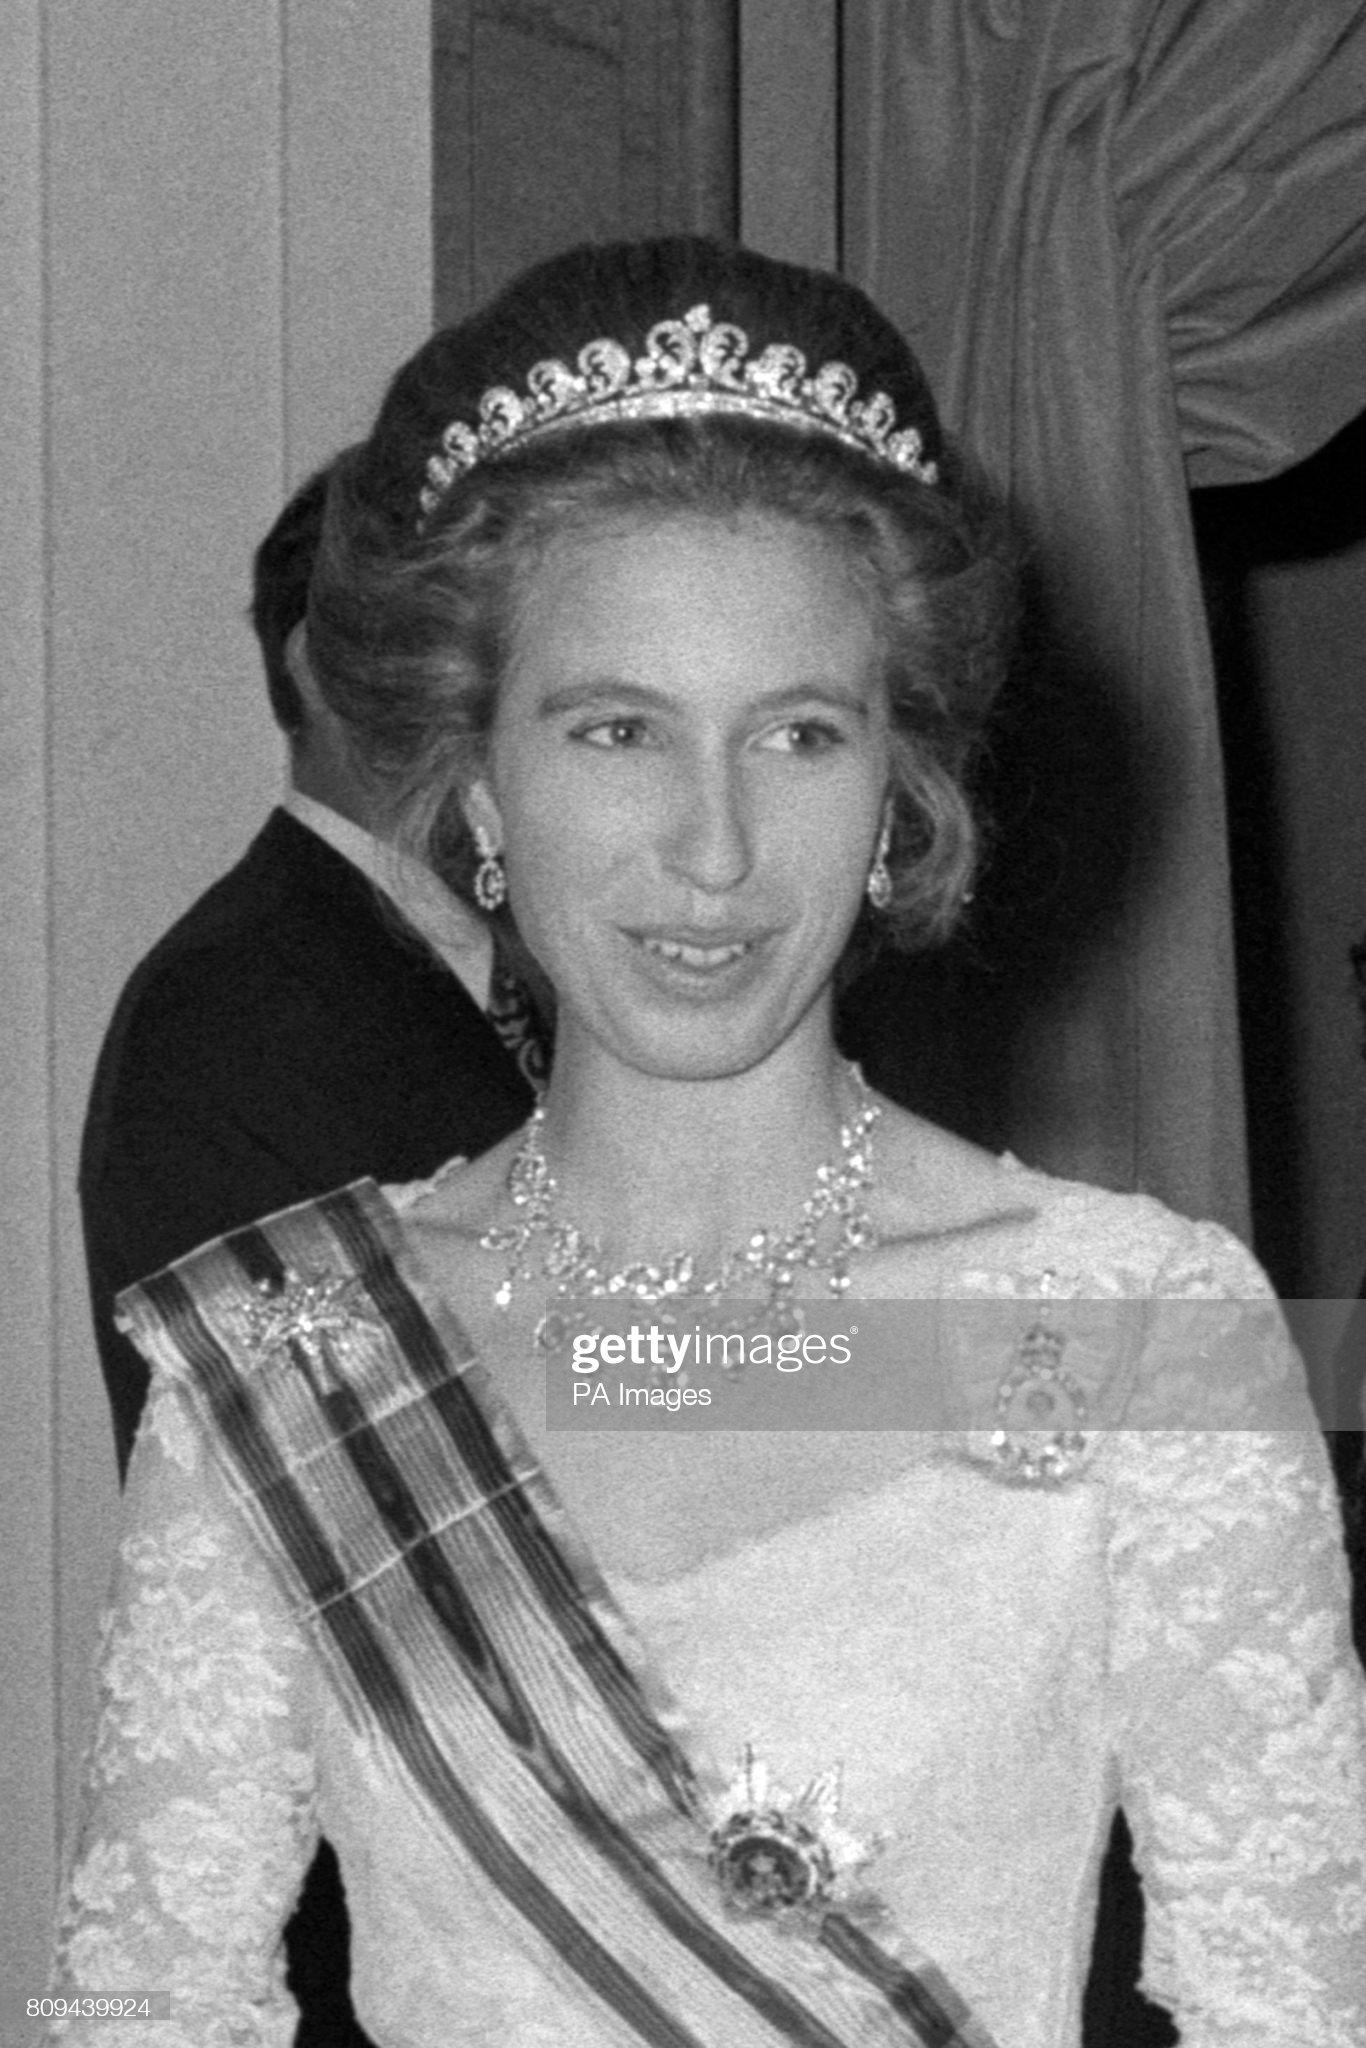 Royalty - Grand Duke of Luxembourg Banquet - Claridge's : News Photo